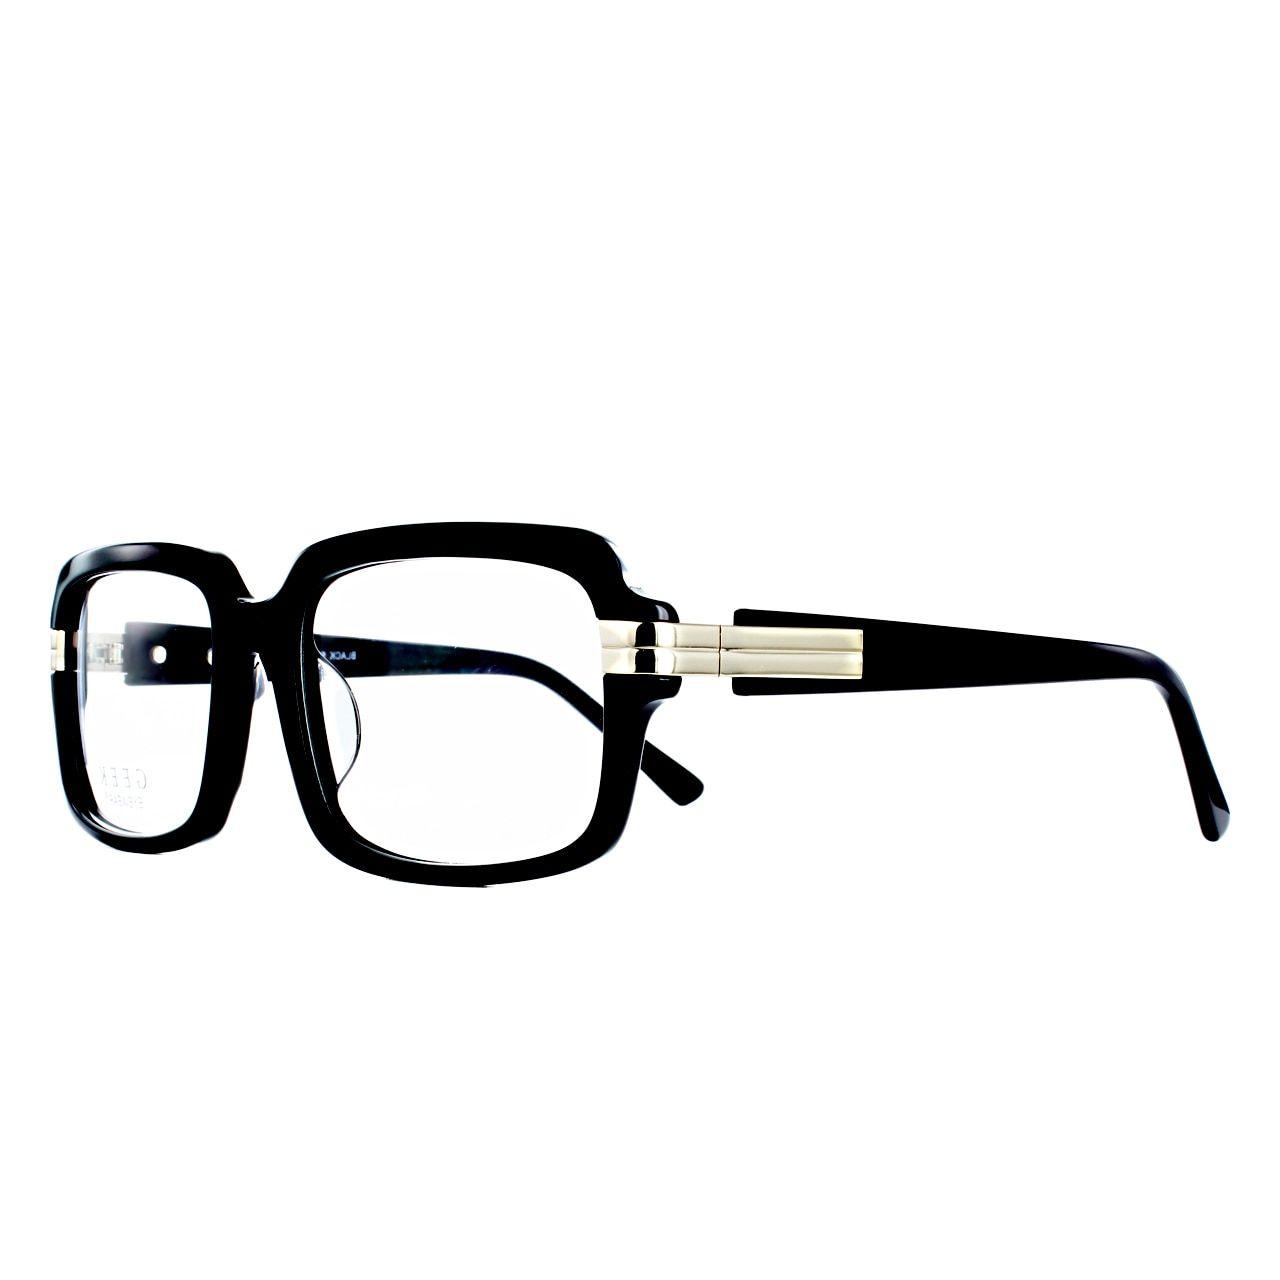 5cbc7103f6d340 GEEK Eyewear GEEK ROUQ 8   Eyewear   Pinterest